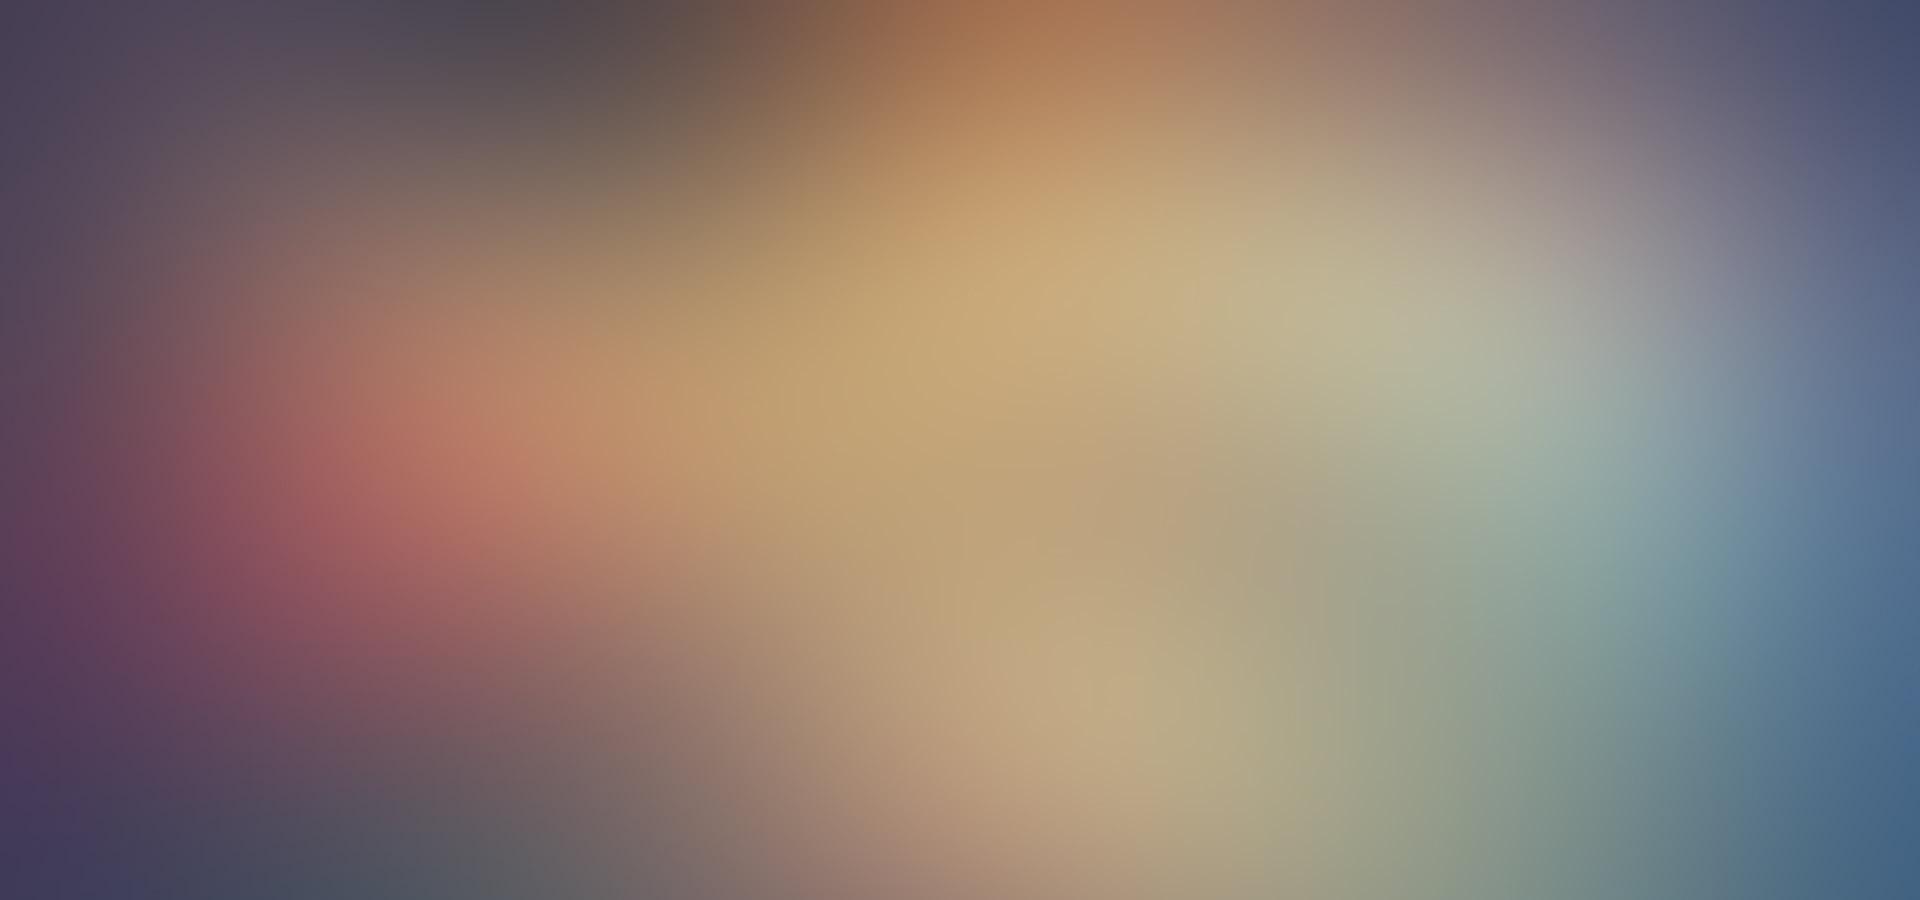 Ipromo Array image81